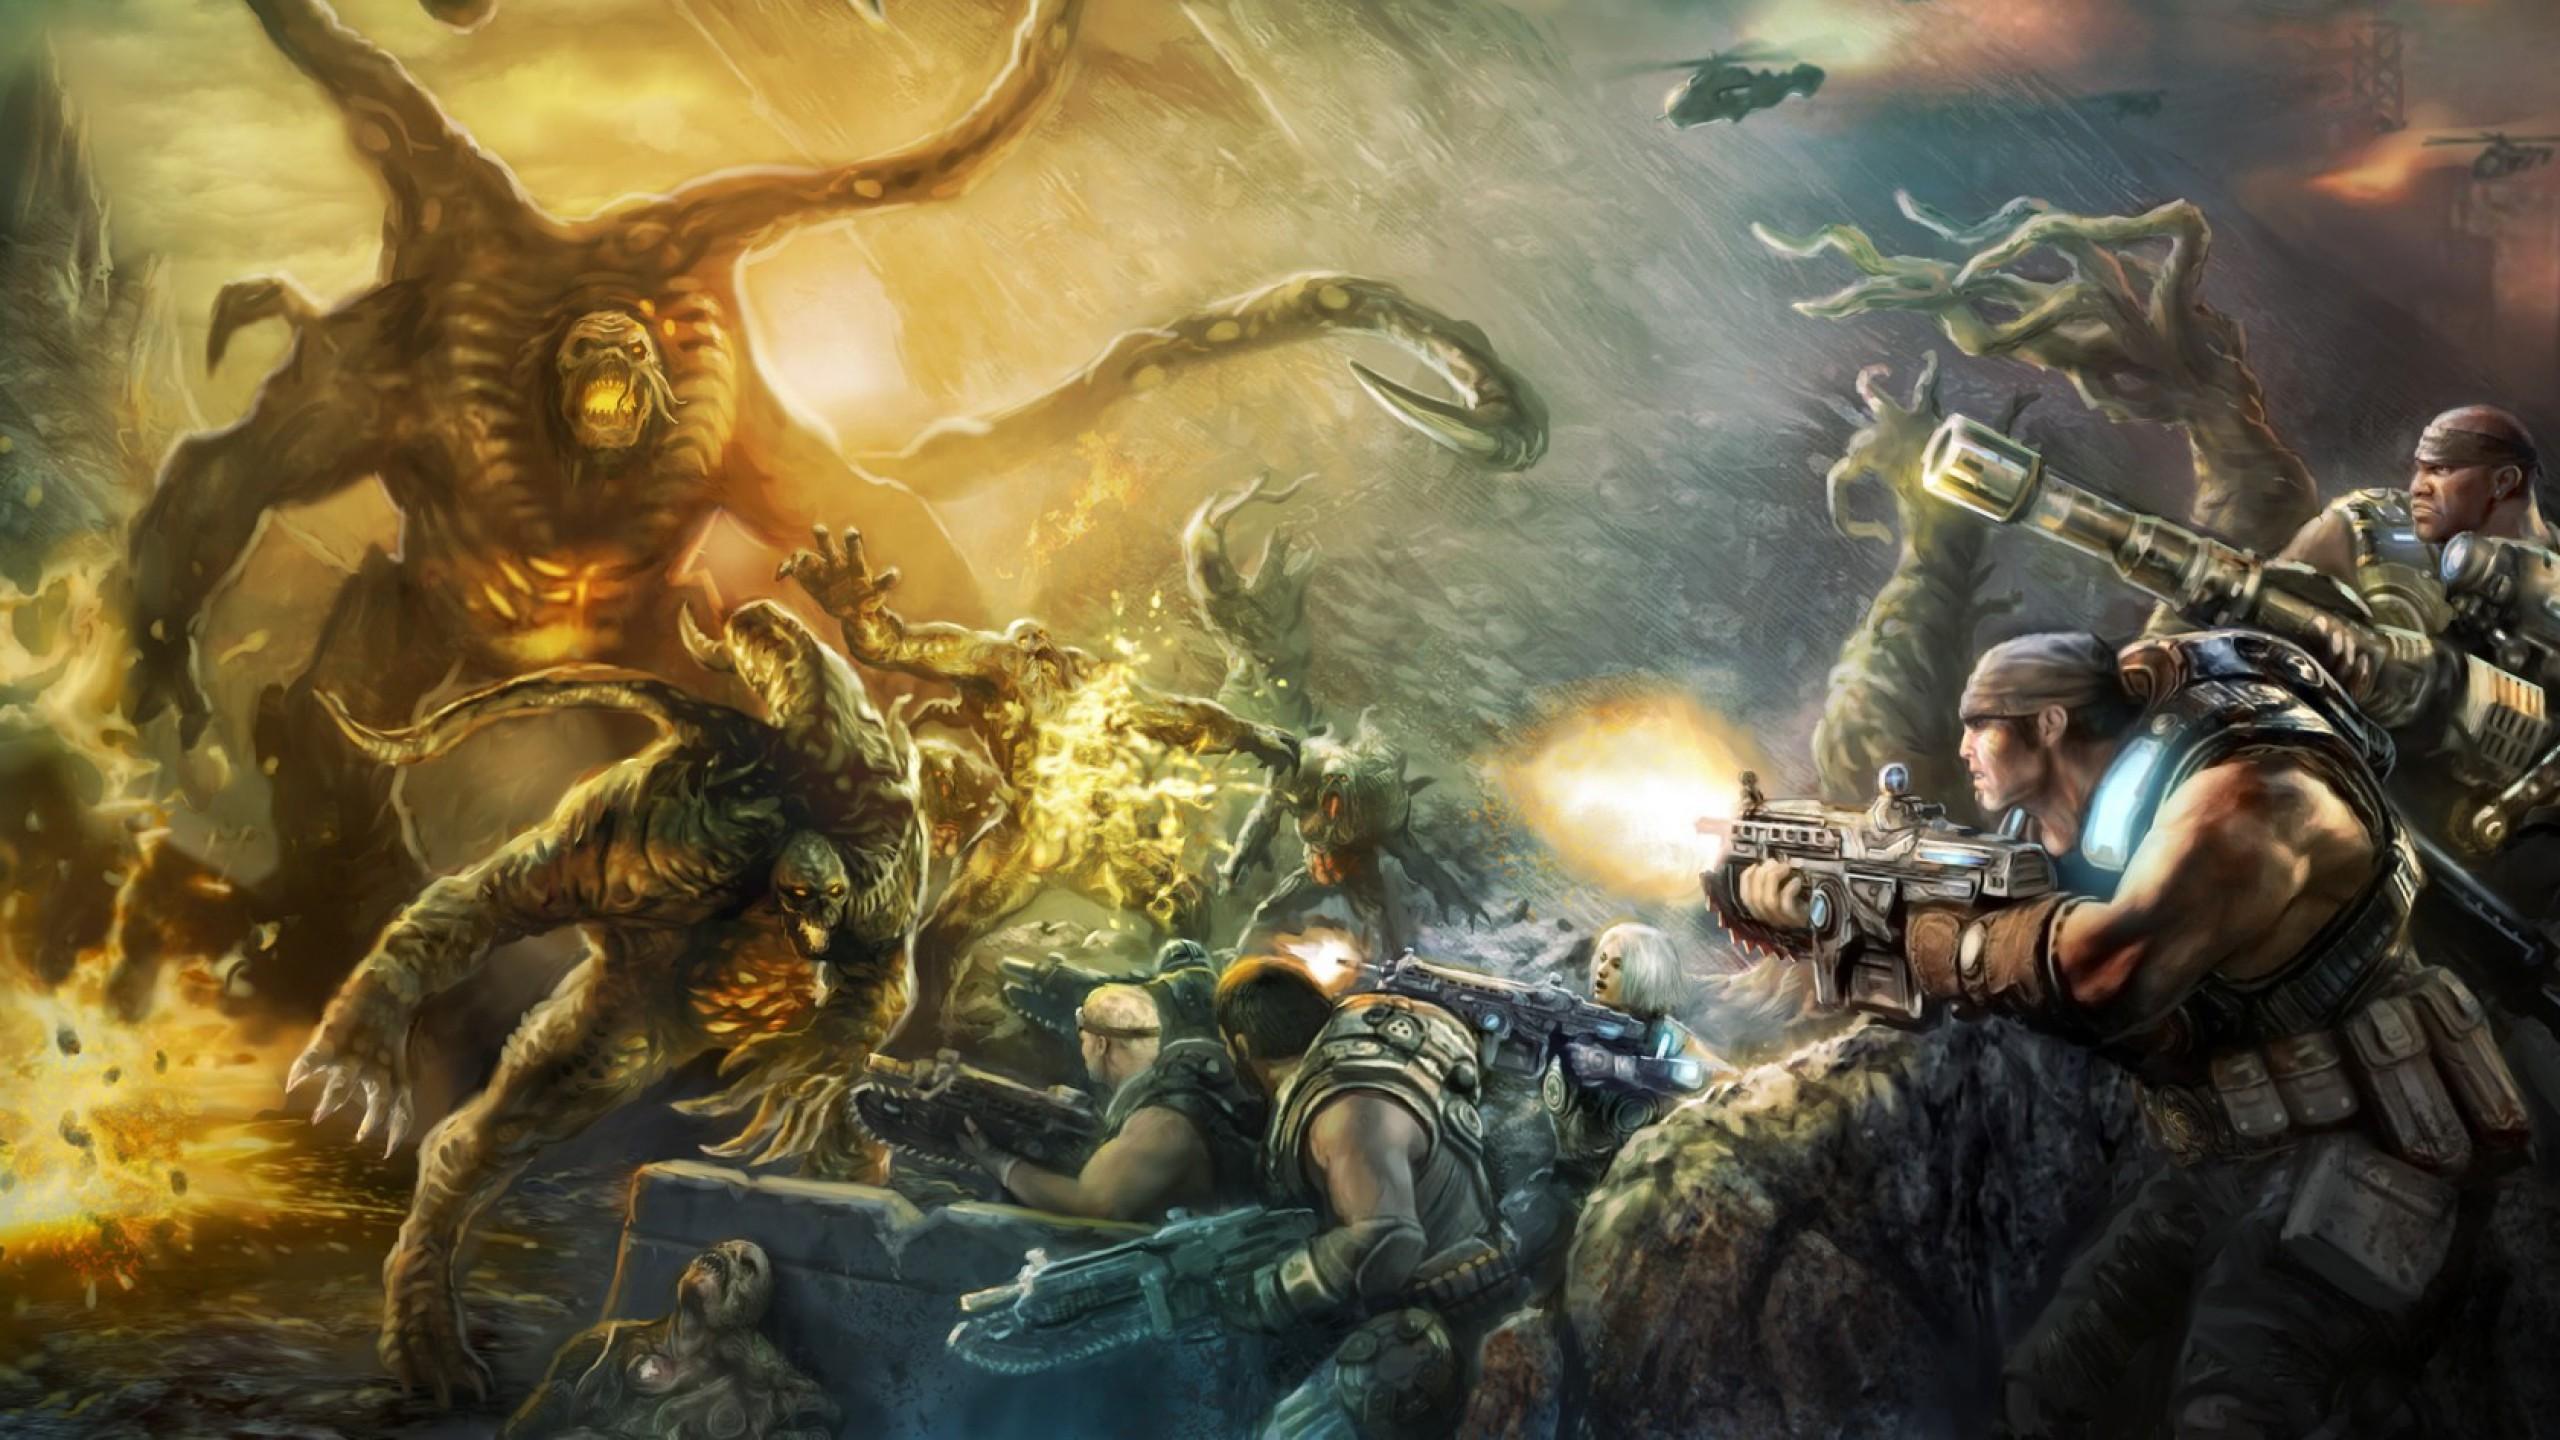 Wallpaper gears of war judgment, art, video game, epic games